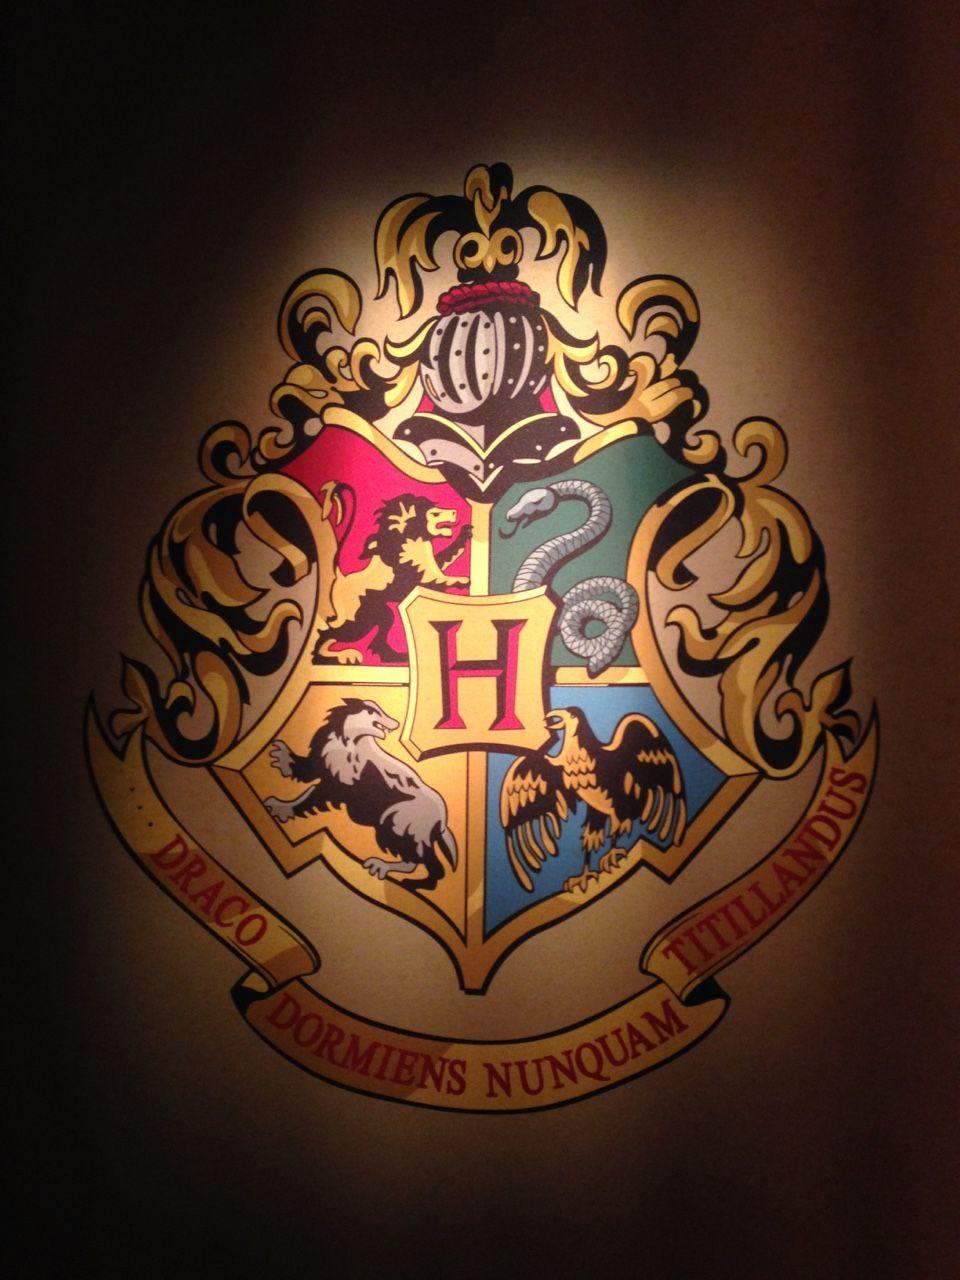 Good Wallpaper Harry Potter Iphone 7 - wp2141437  HD_252942.jpg